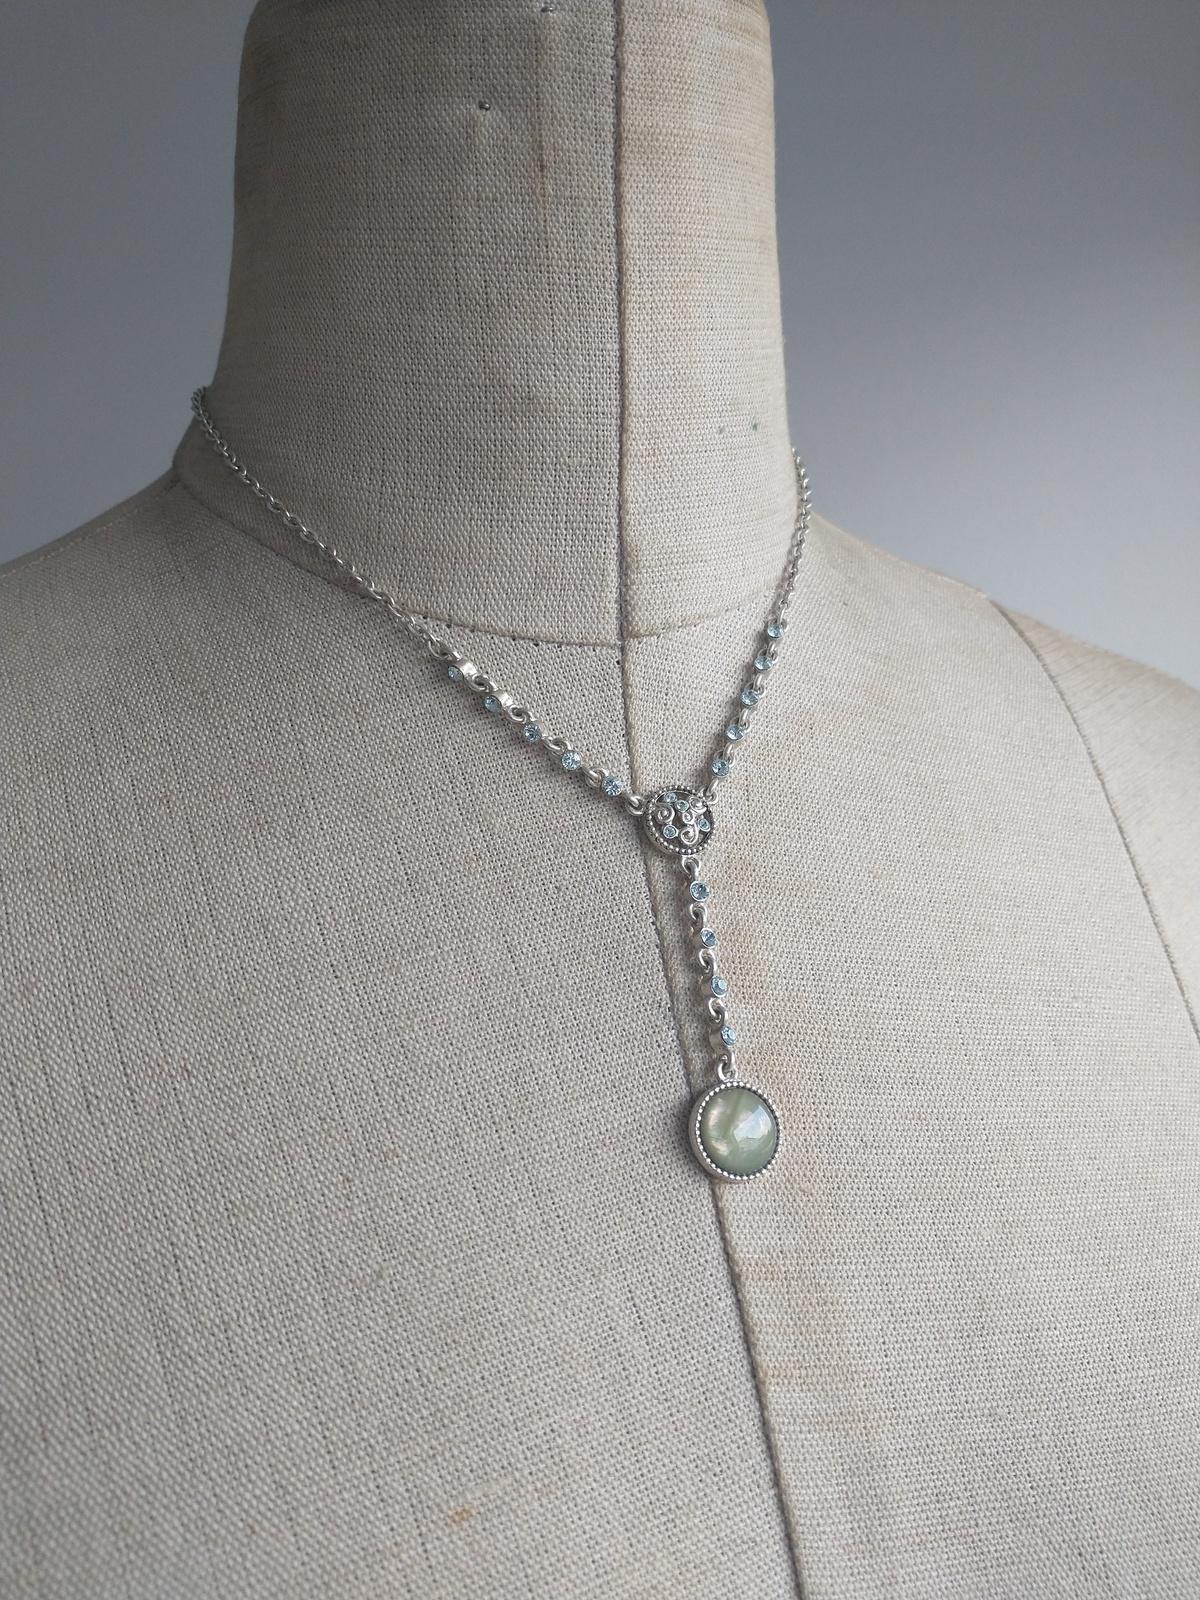 1928 silver tone pendant mint cabochon blue rhinestones - $10.00